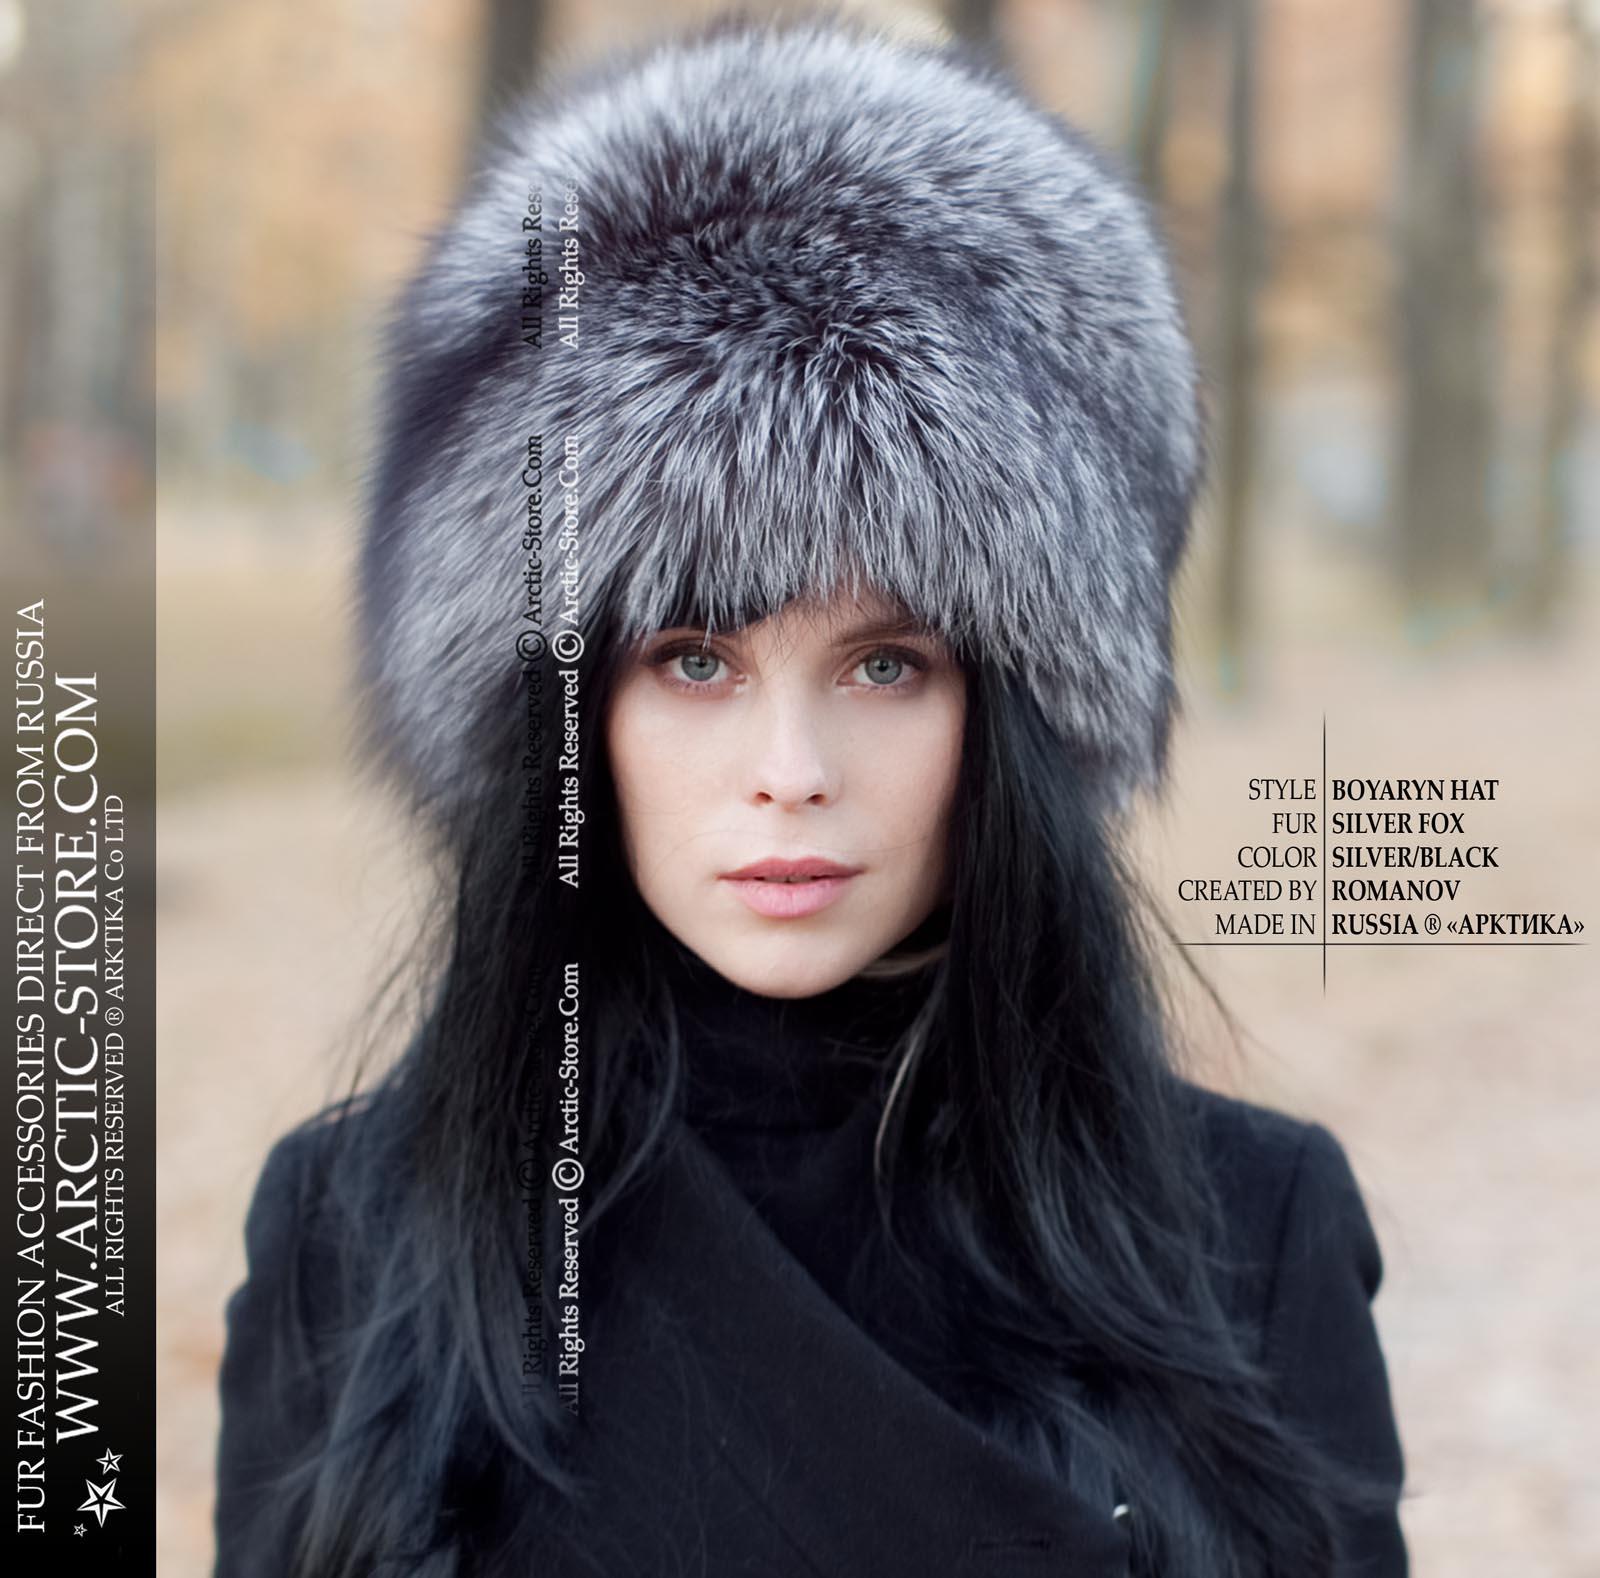 69876c17b4e21 Boyaryn Original Russian silver fox fur hat. Authentic design direct from  Saint-Petersburg